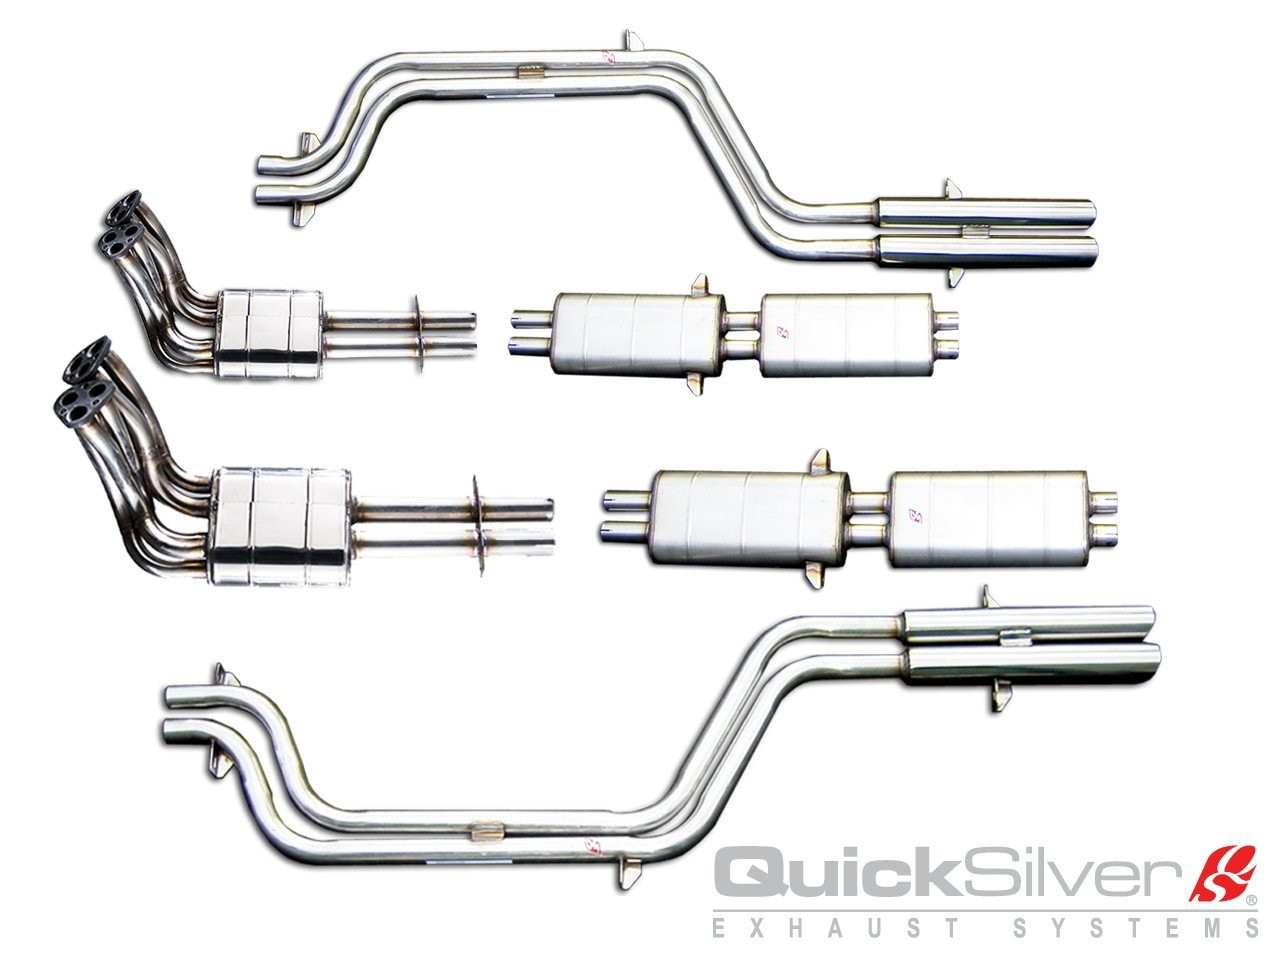 QuickSilver Exhausts Heritage | Ferrari 275 GTB/4, 1966-68, FE013 (Výfukový systém – nerezová ocel)